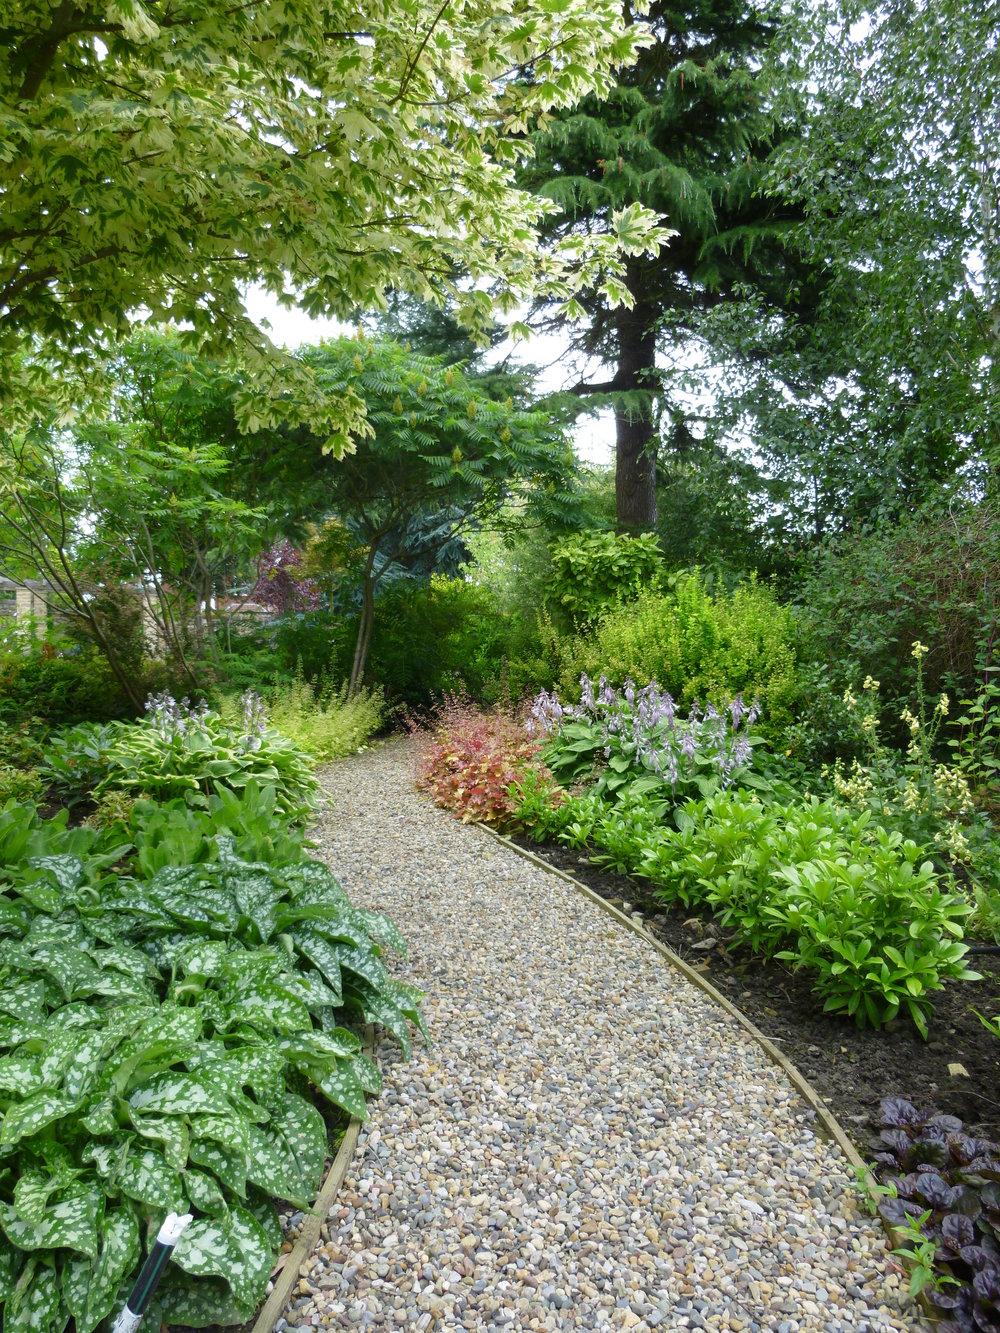 New woodland paths lead through the ornamental planting.